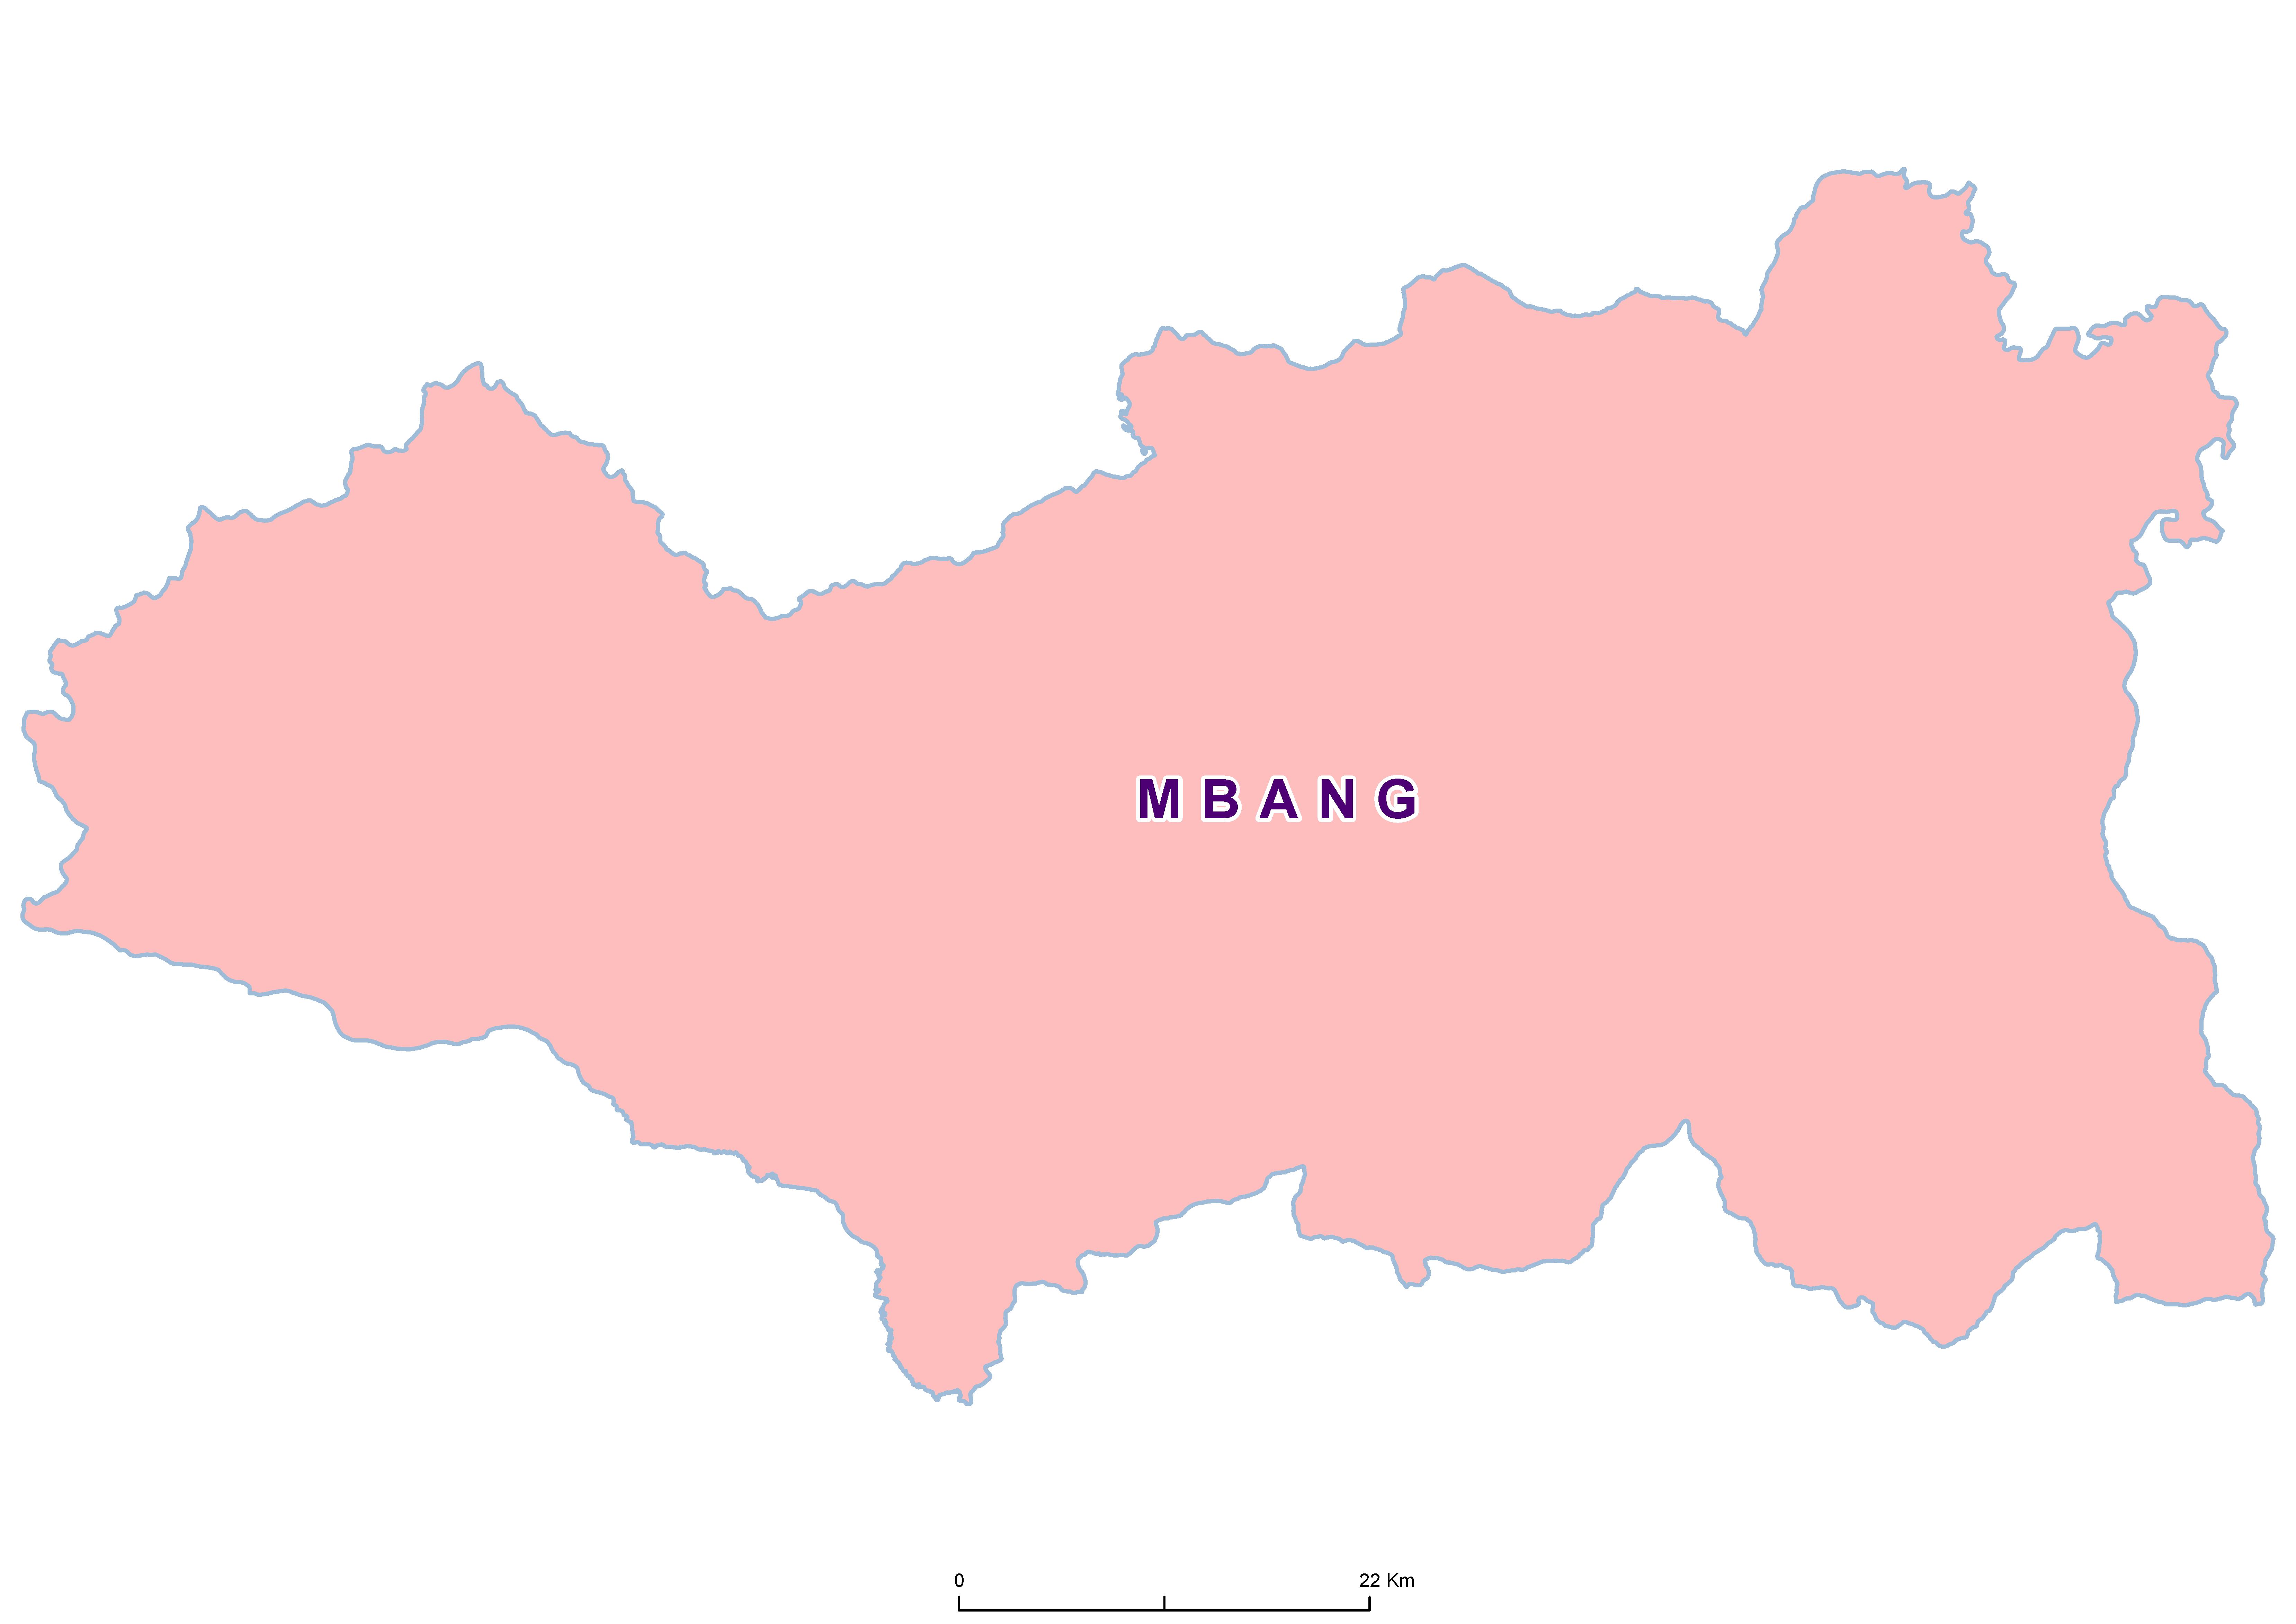 Mbang Mean SCH 20100001